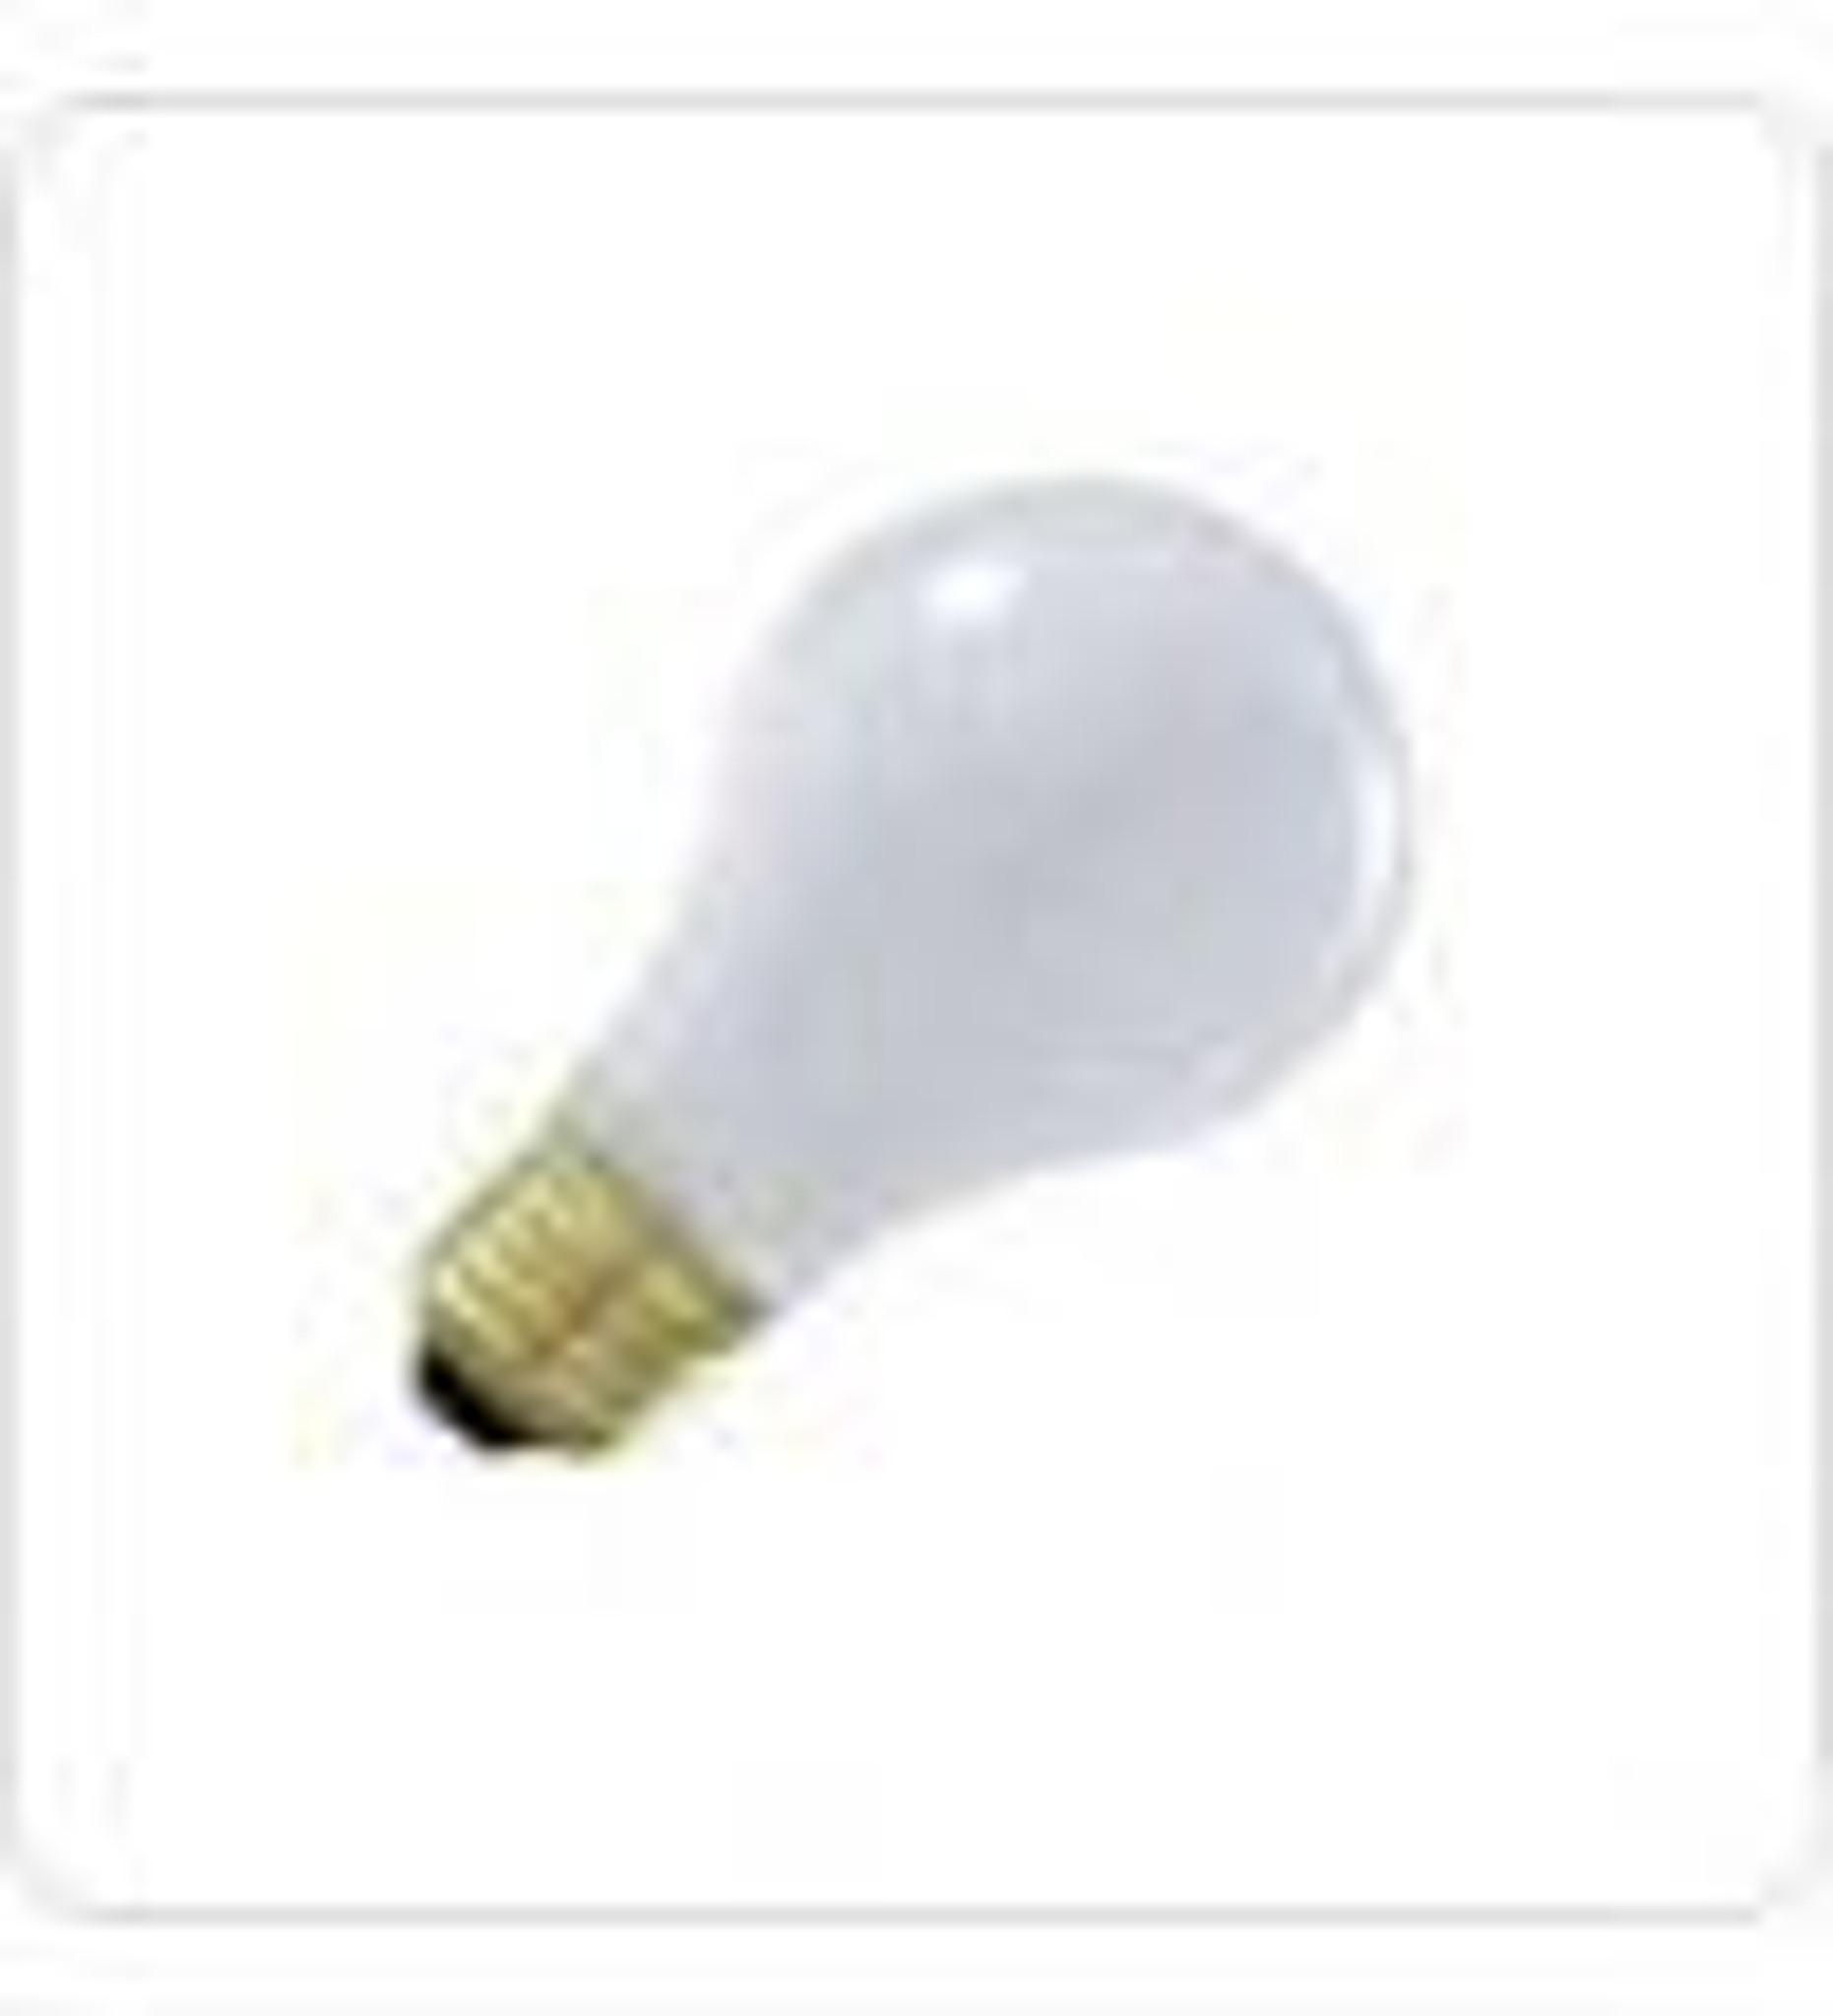 Medium Base (Standard Bulbs)